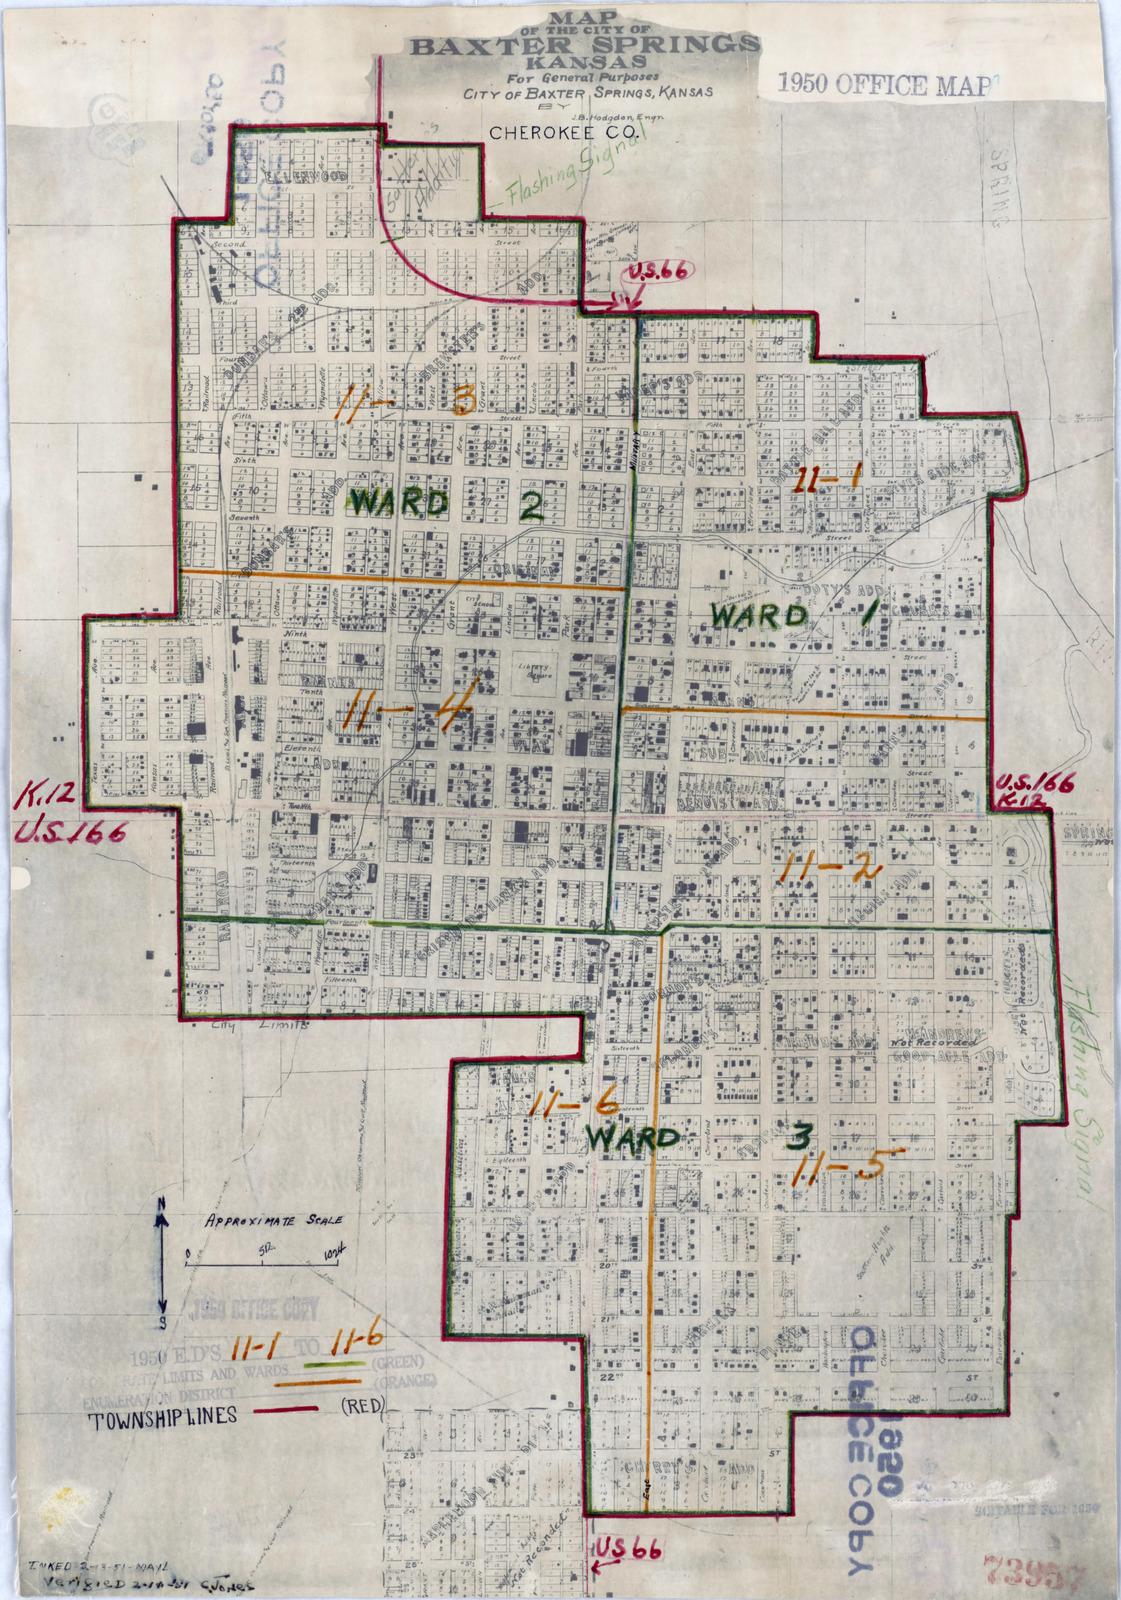 1950 Census Enumeration District Maps - Kansas (KS) - Cherokee ... on www.kansas map, kansas indians map, kansas wind map, kansas with capital, kansas dot maps, kansas map with cities only, st. marys kansas map, kansas shape map, cimarron kansas map, kansas cities population, kansas in us, kansas name, kansas info, kansas road map, kansas highway map pdf, kansas state on map, kansas wall map, kansas state physical map, kansas small town map, the kansas map,